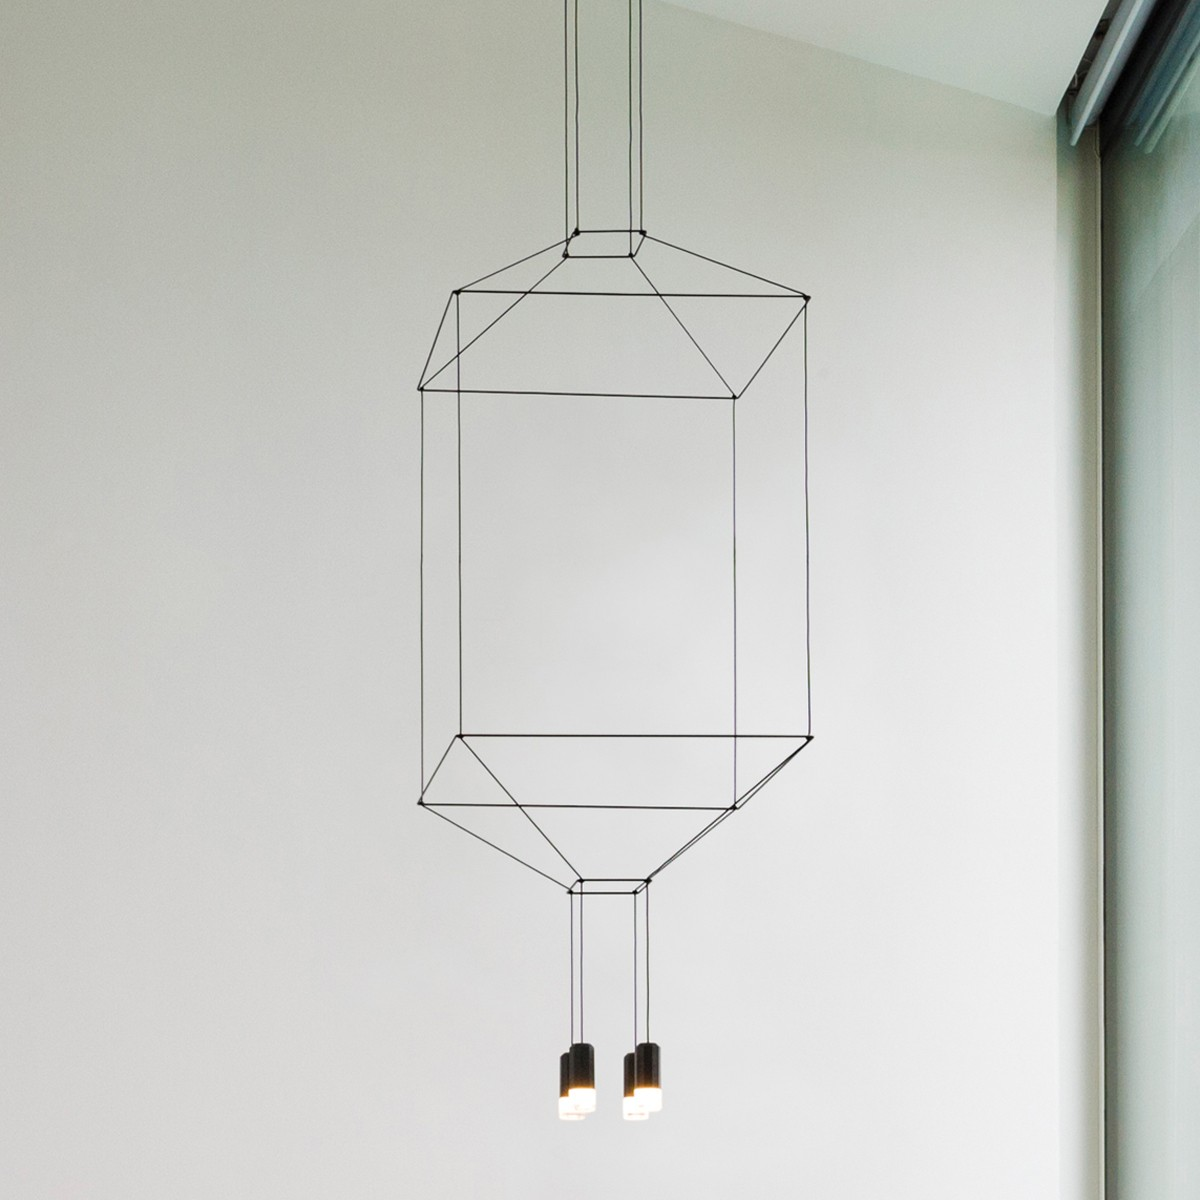 Vibia Wireflow Pendelleuchte, 4-flg., 100 x 100 cm, schwarz